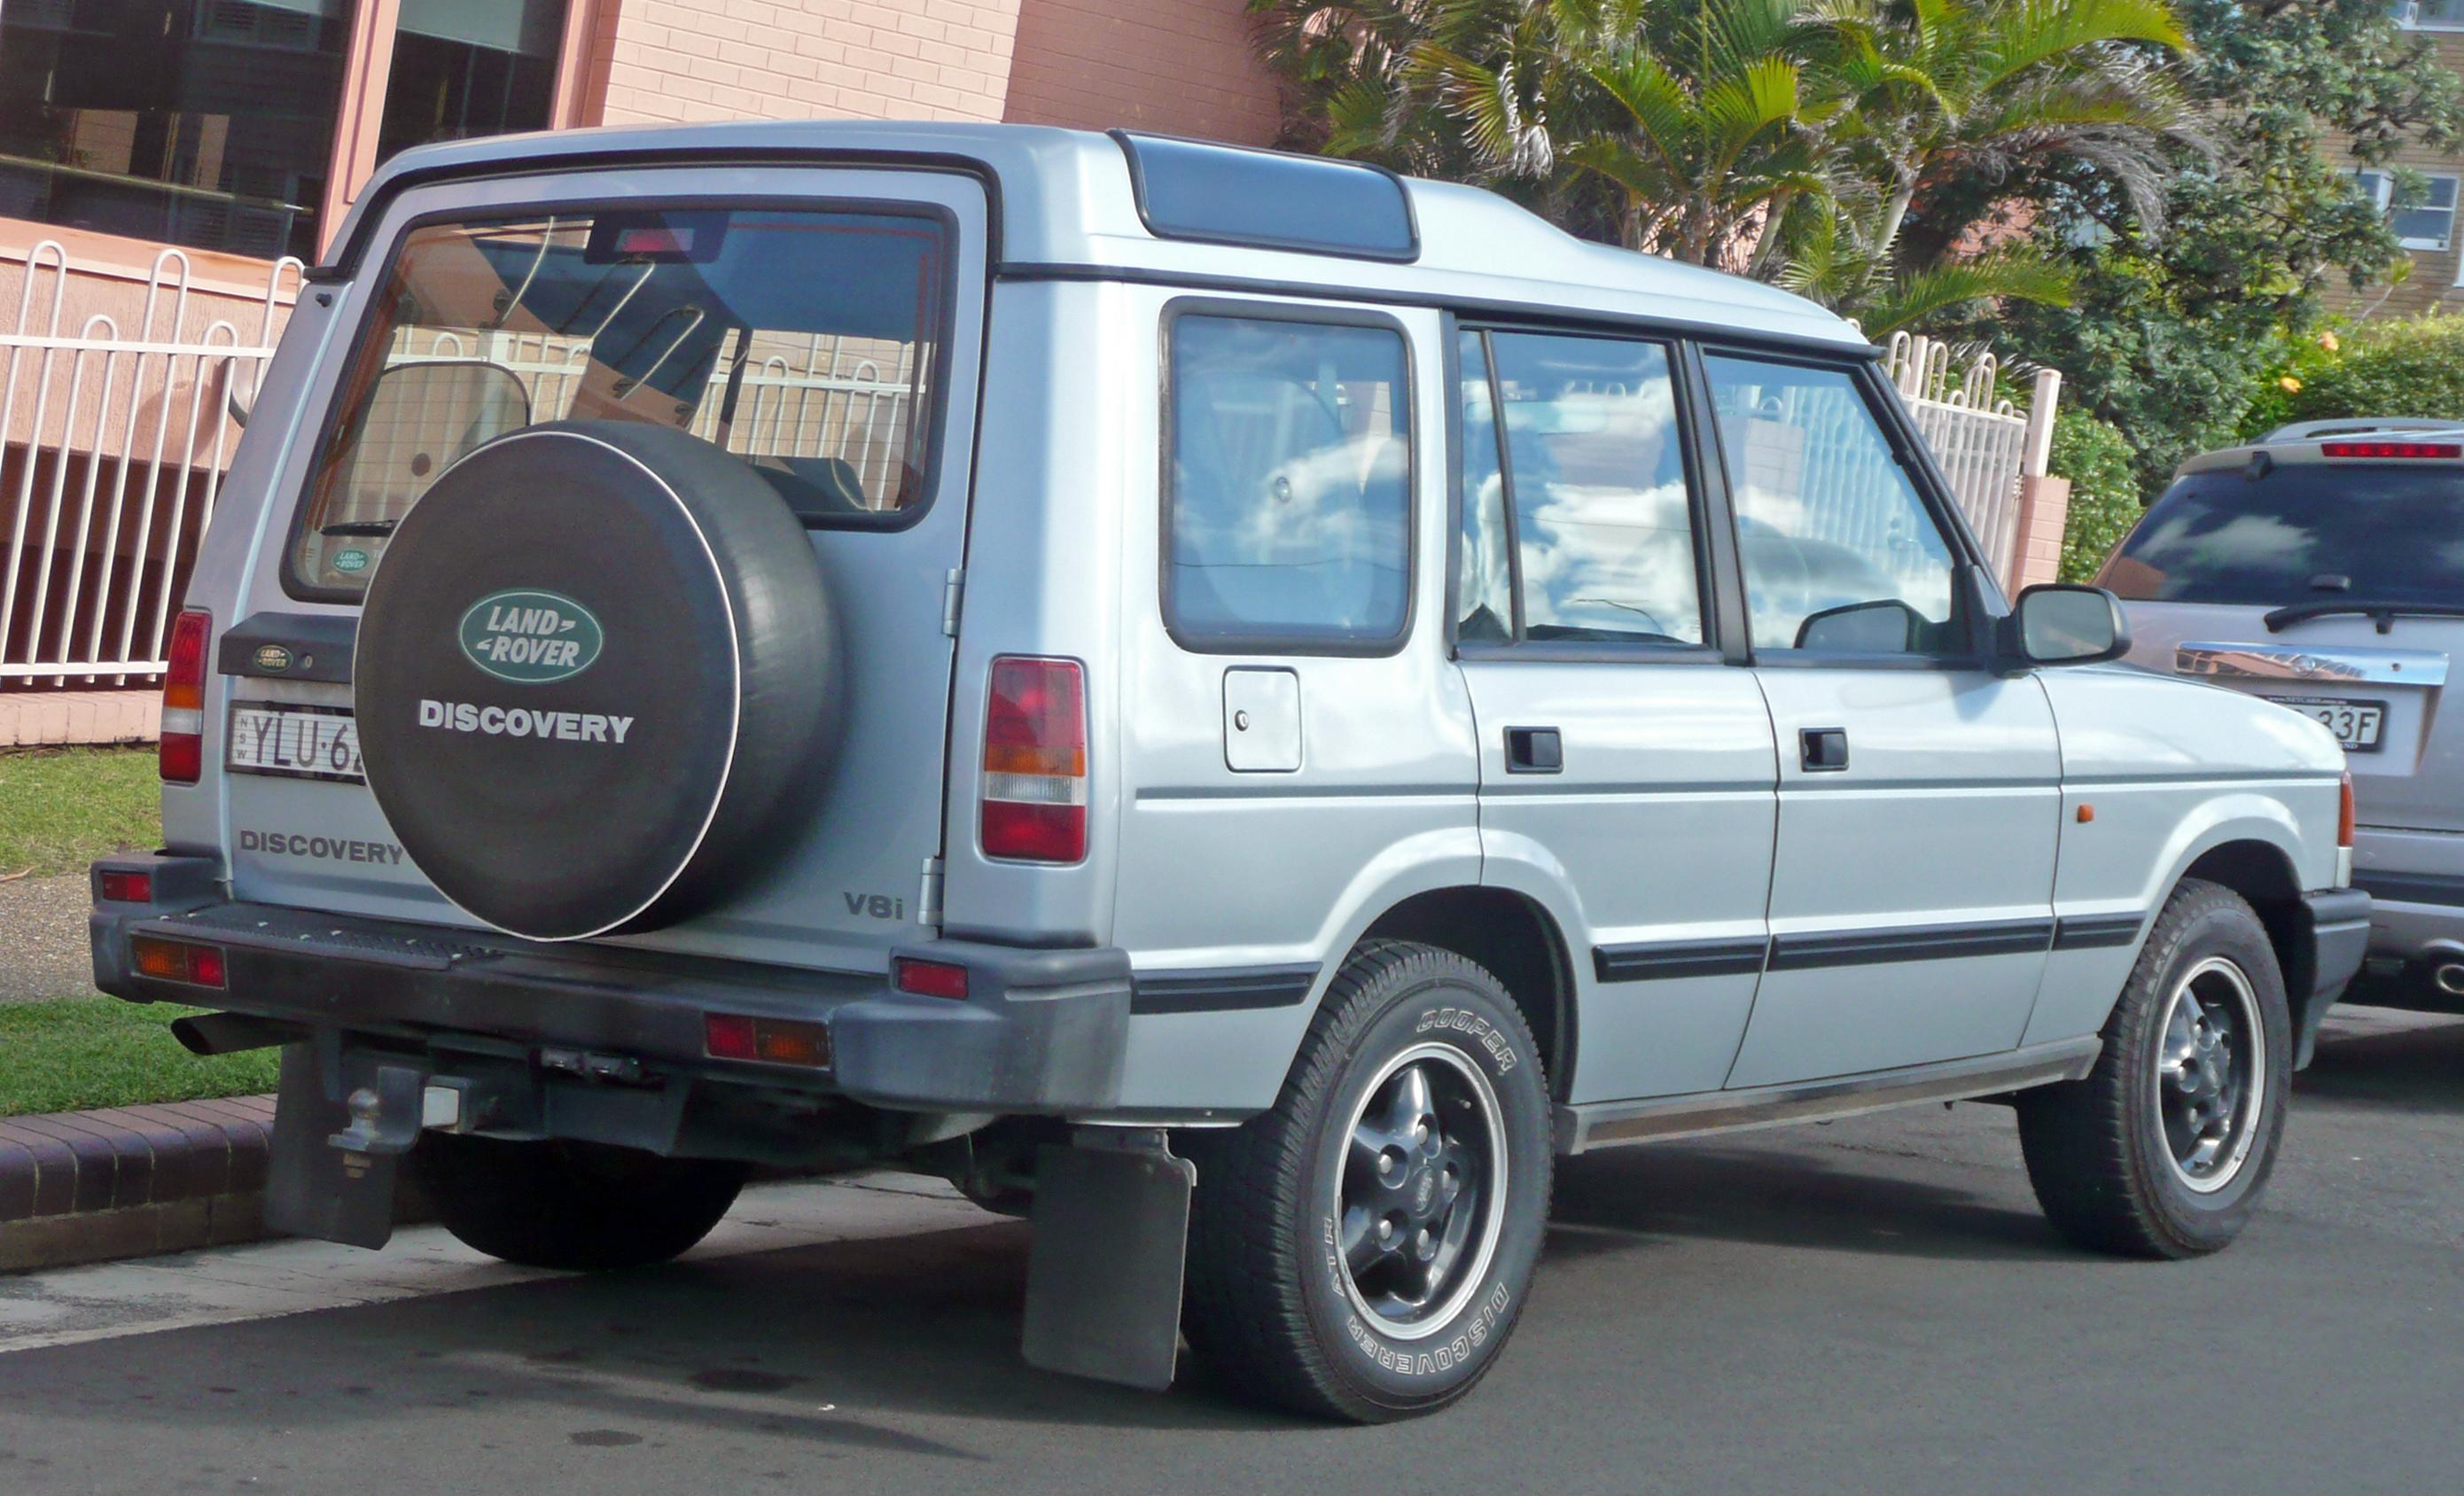 File 1994 1997 Land Rover Discovery V8i 5 door wagon 02